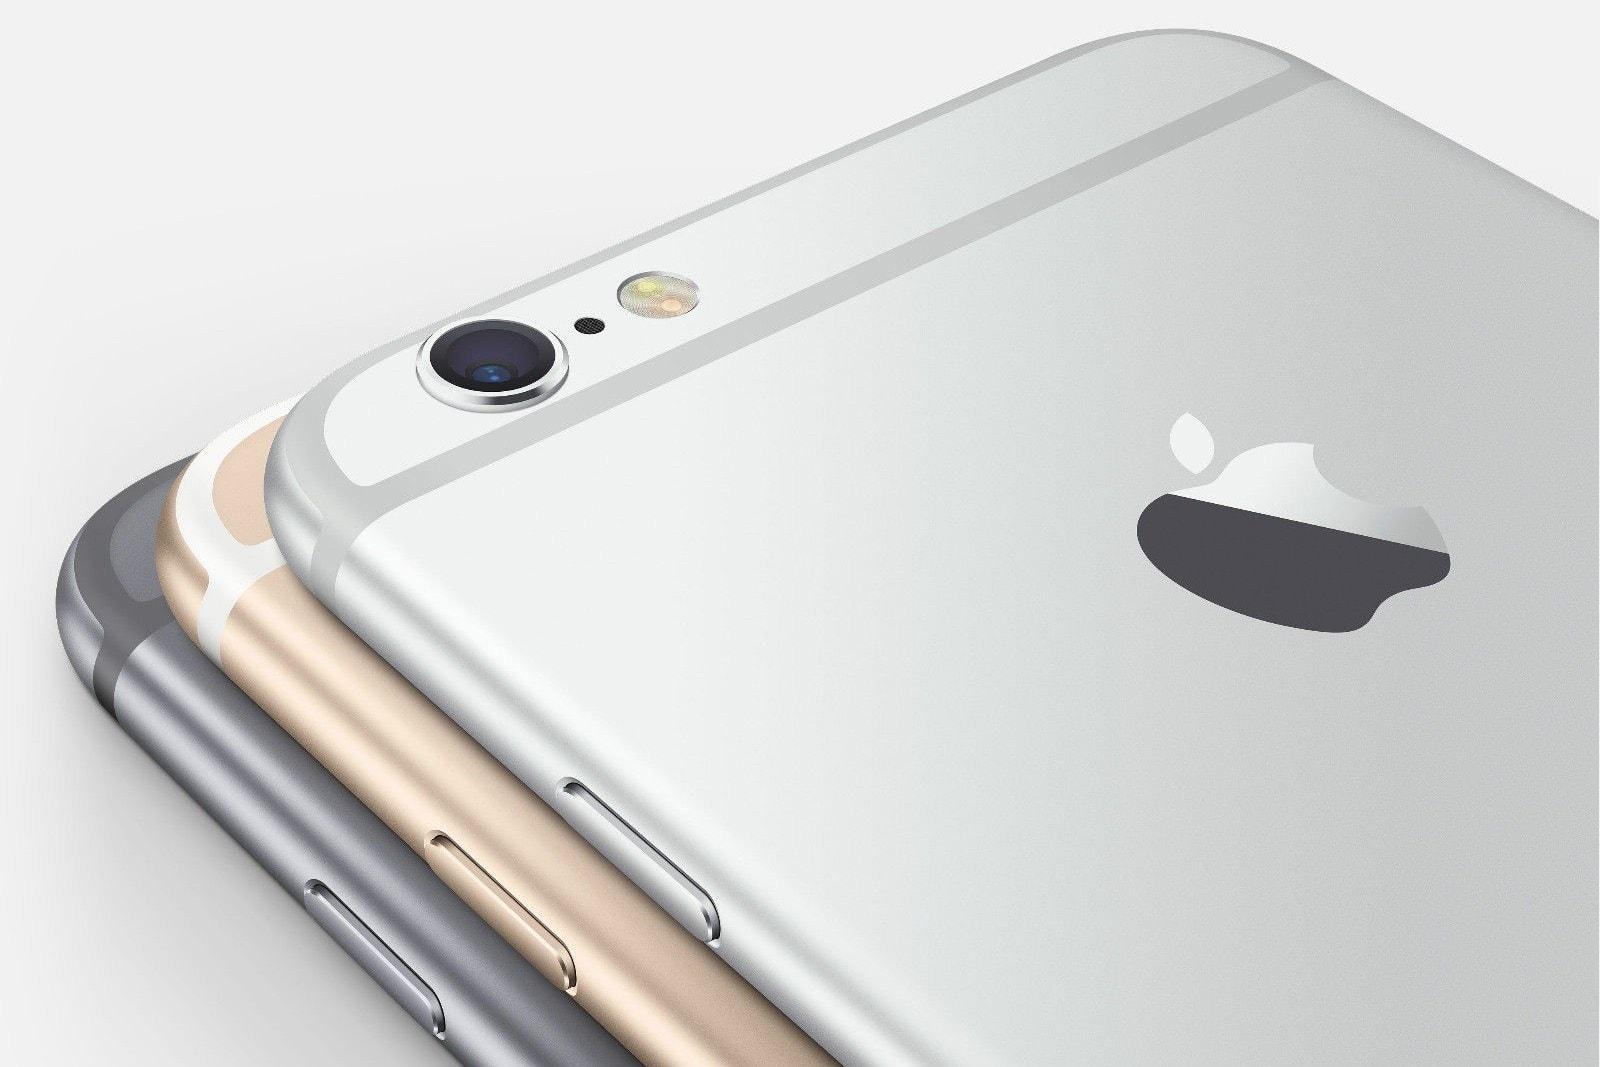 iphone-7-shorter-leak-techtastic-0